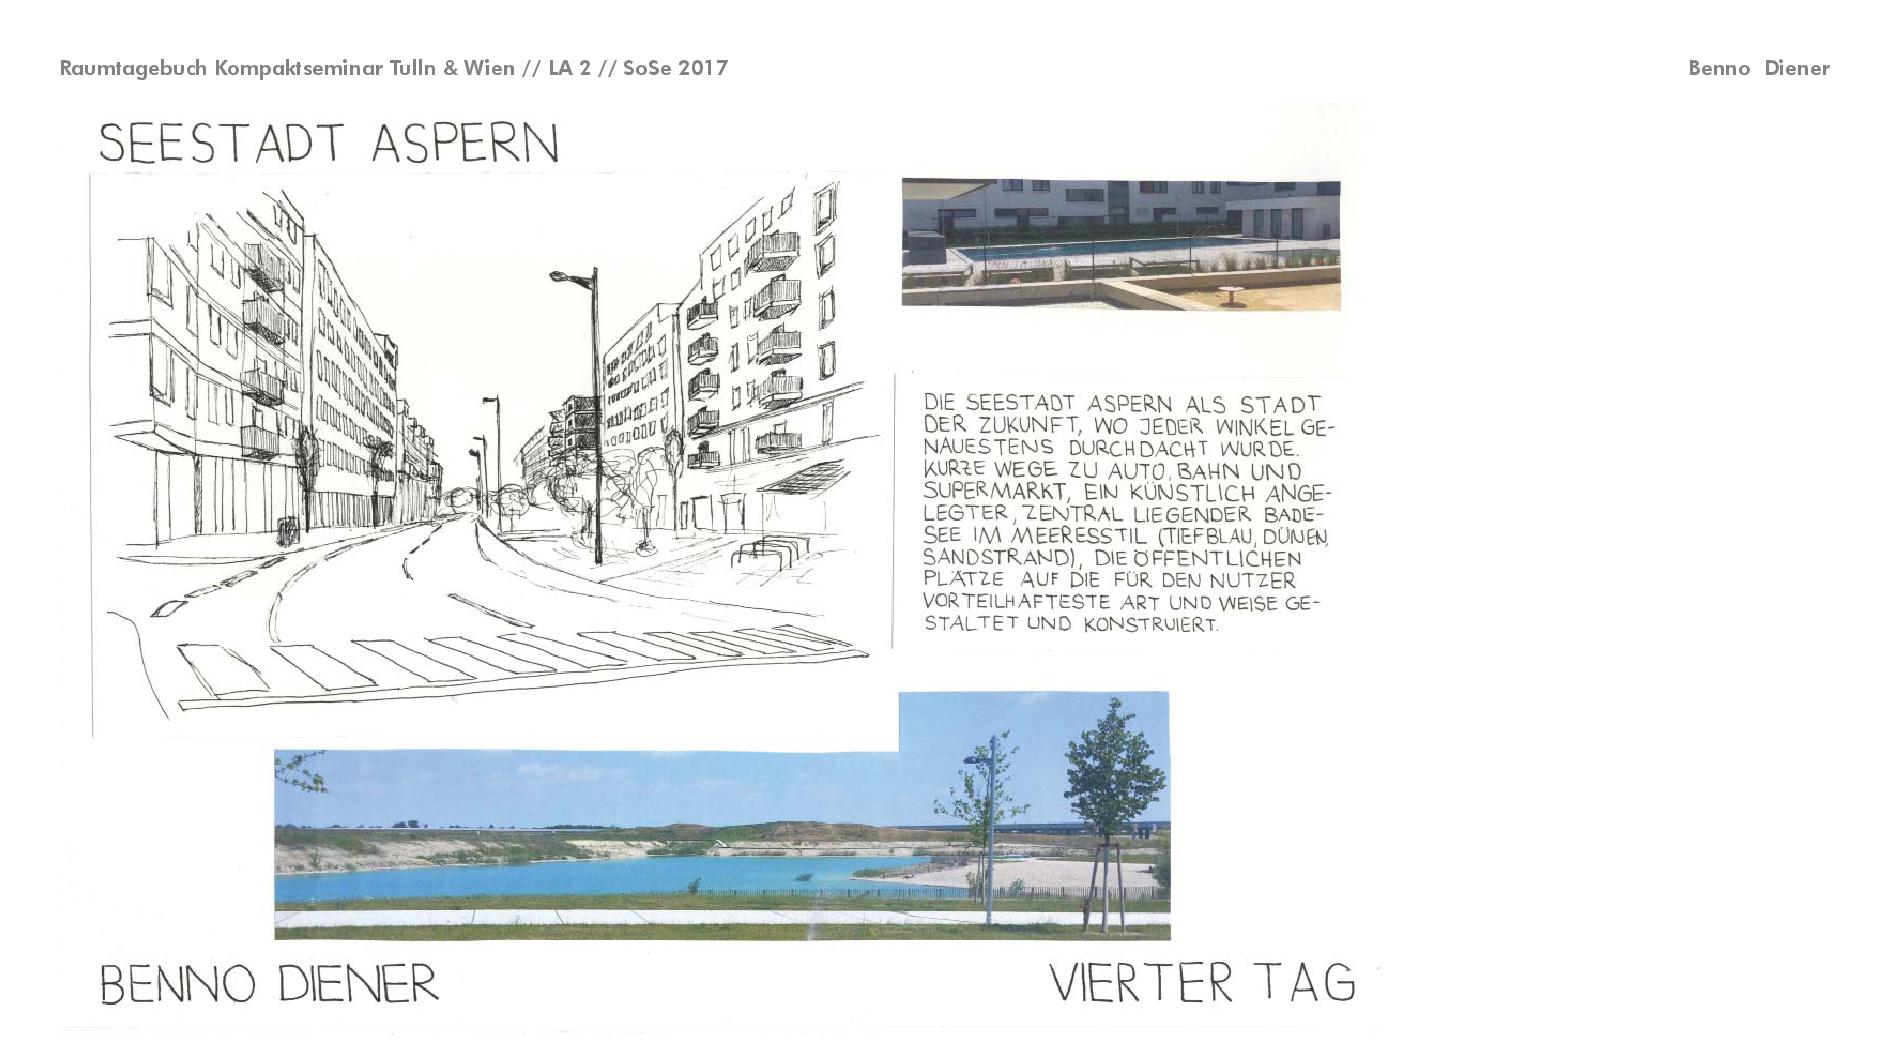 NEU Screen Raumtagebuch Tulln Wien SoSe 17 010